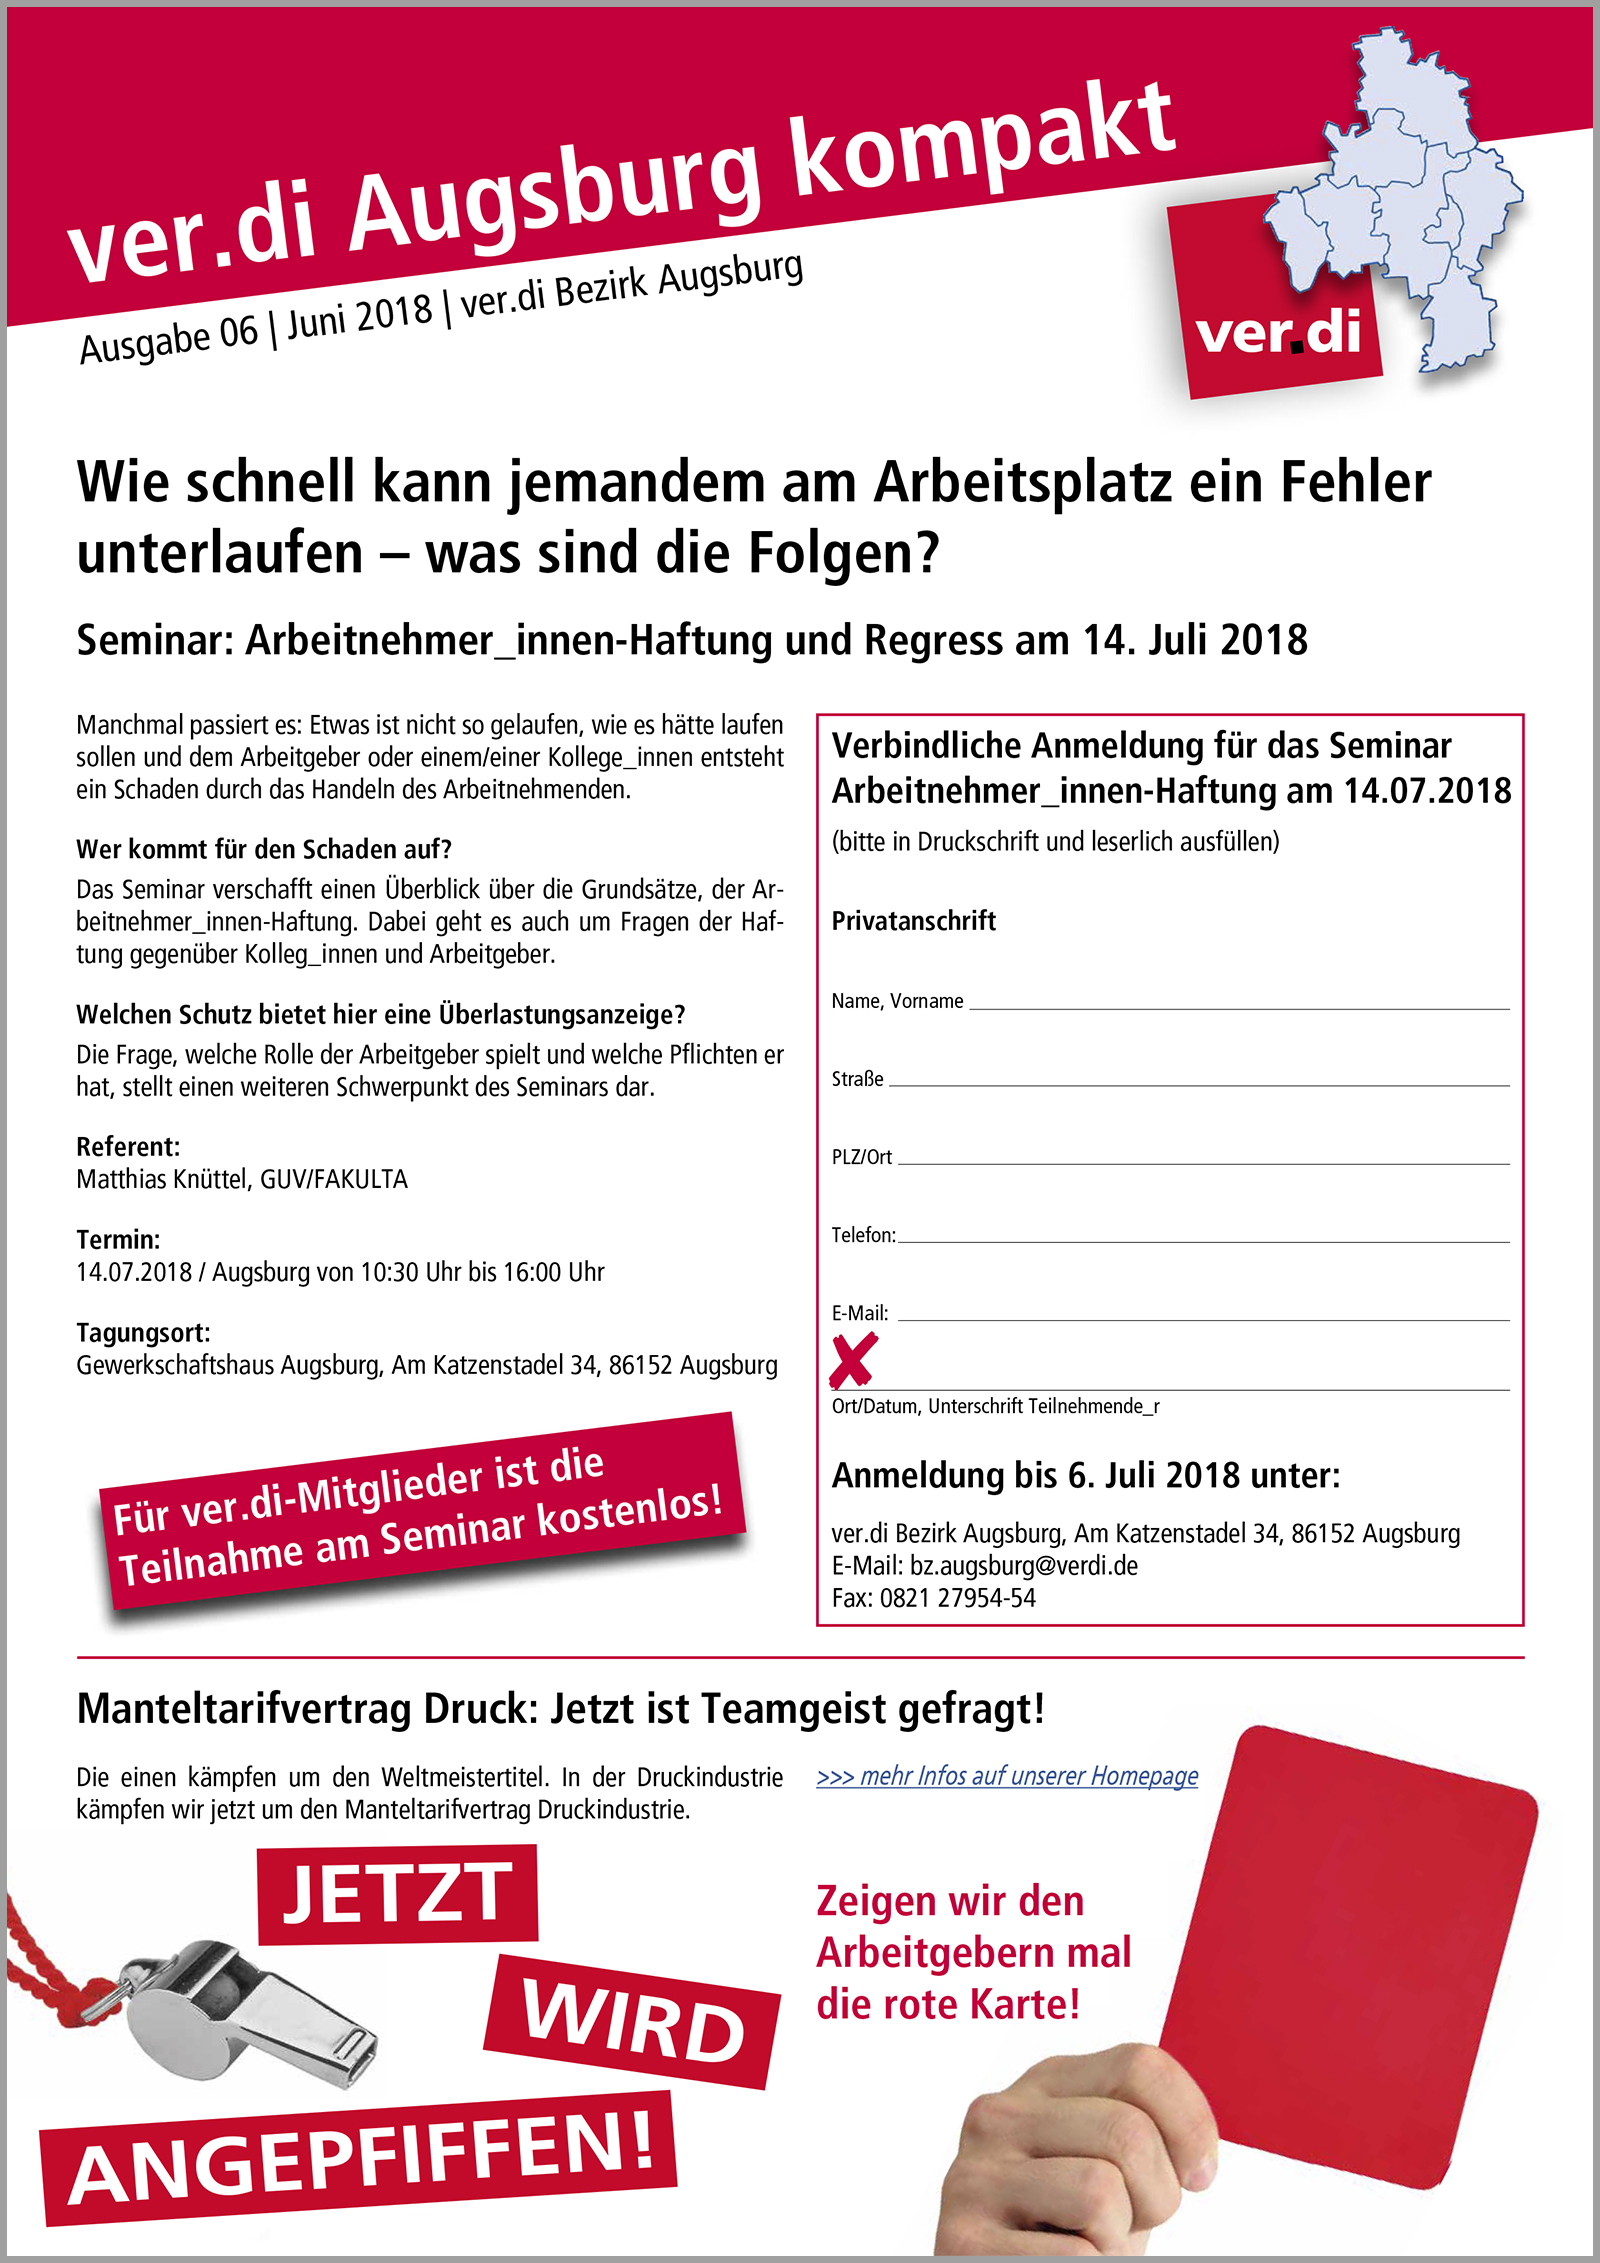 ver.di Augsburg kompakt Ausgabe 03/2018